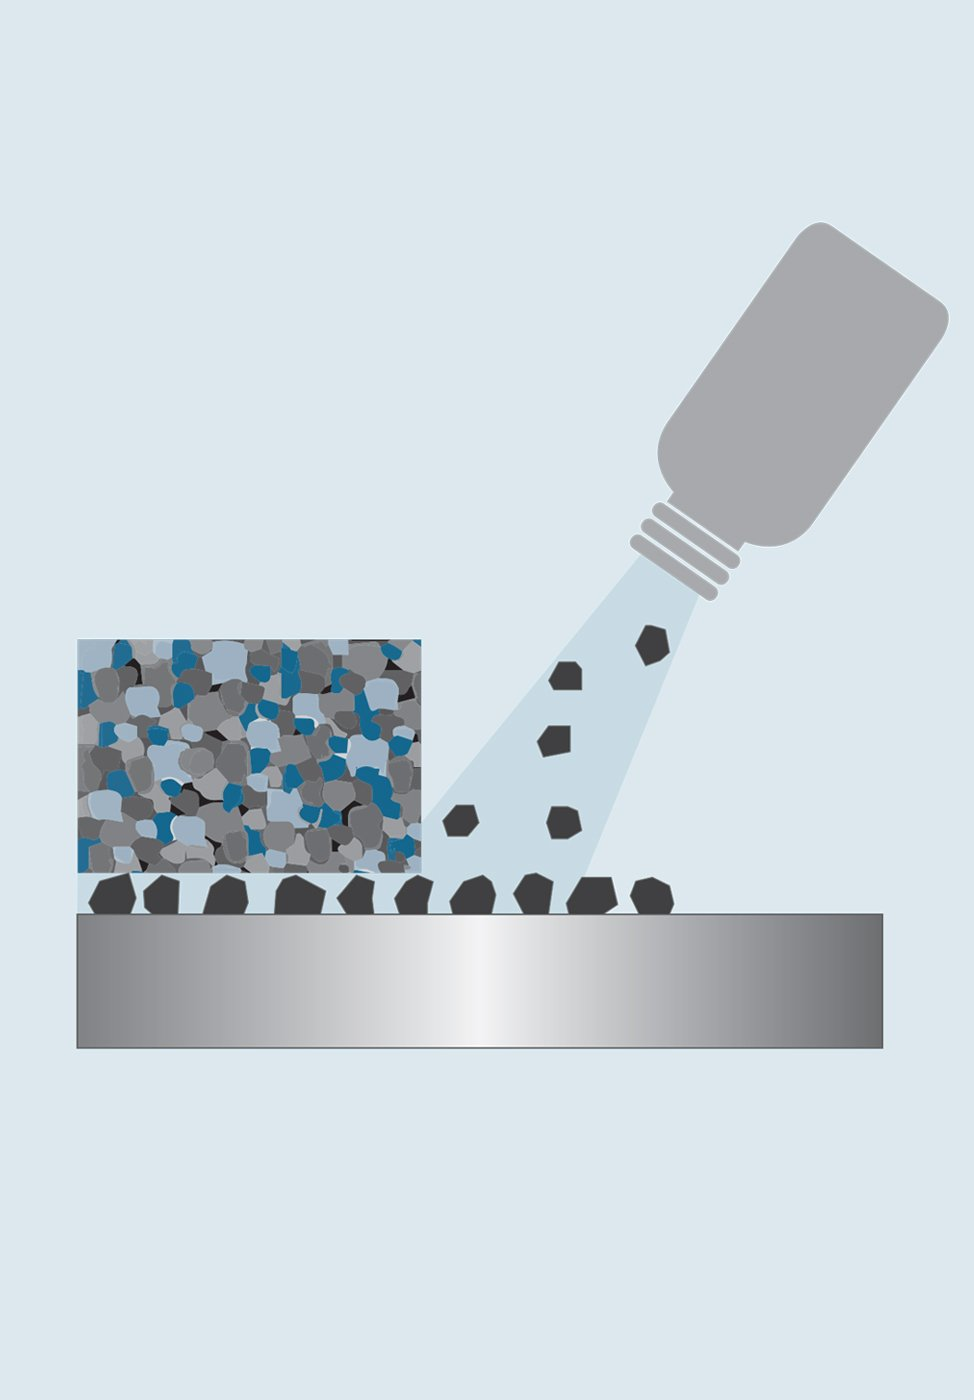 Metallographic grinding and polishing insight | Struers com